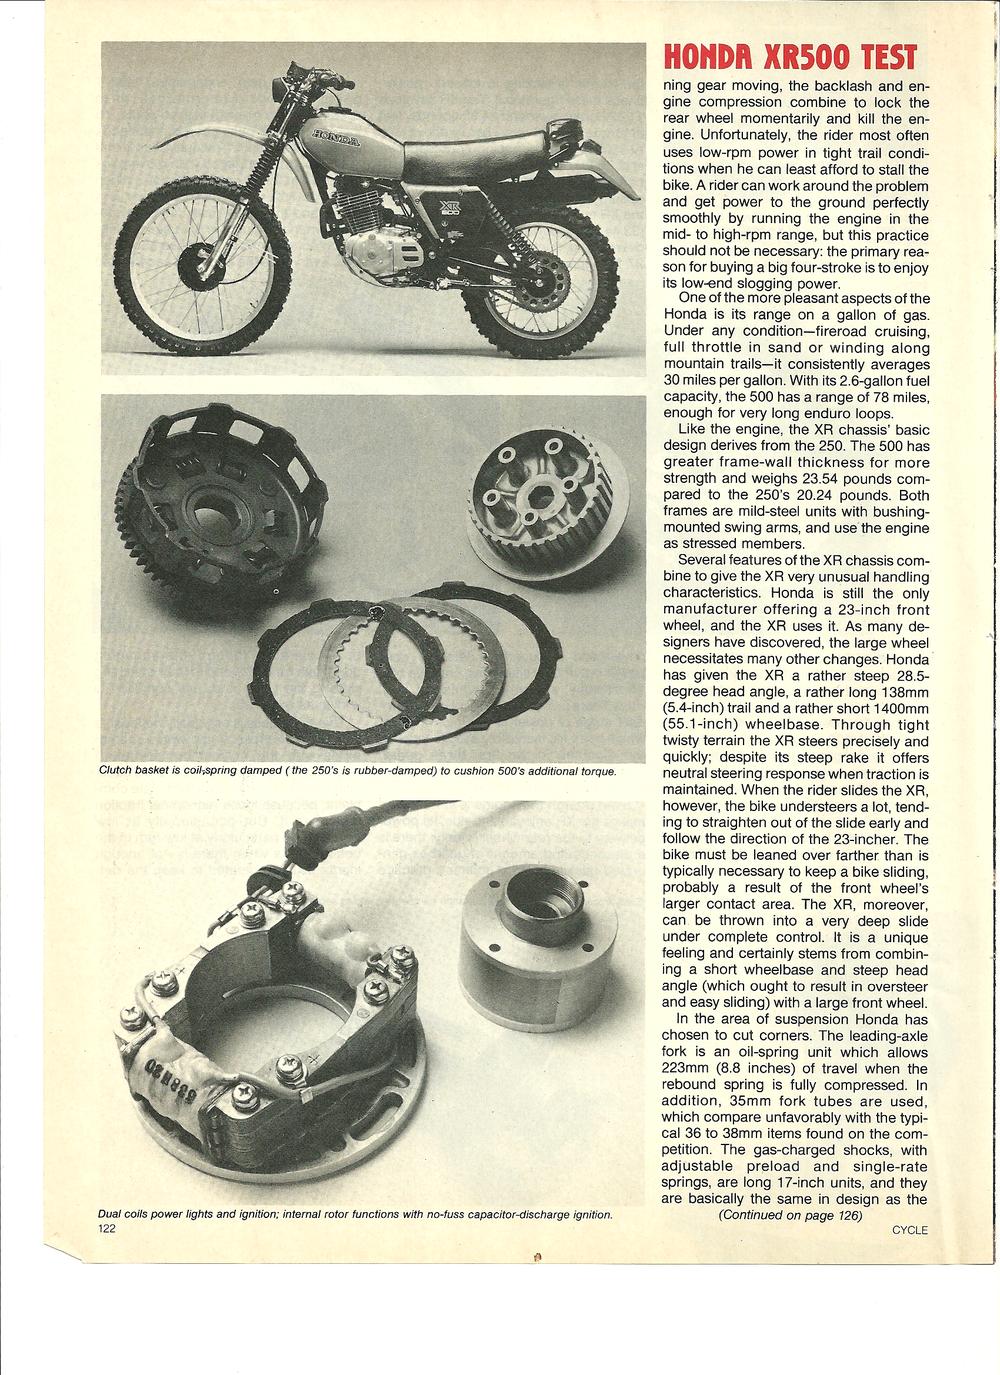 1979_Honda_XR500_test_pg7.png